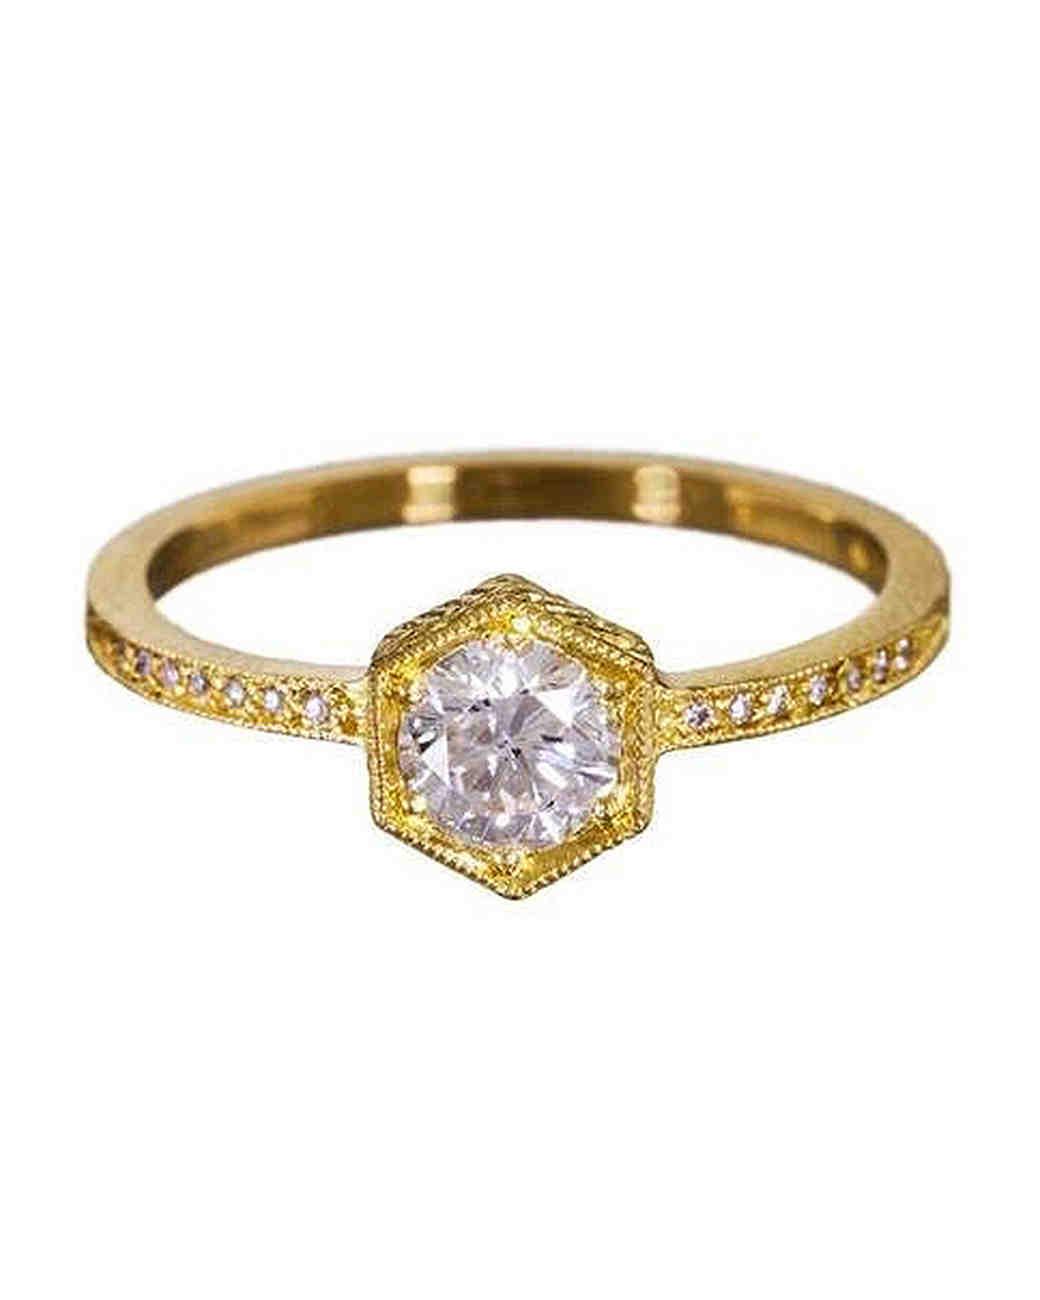 Cathy Waterman Yellow Gold and Diamond Hexagonal Engagement Ring